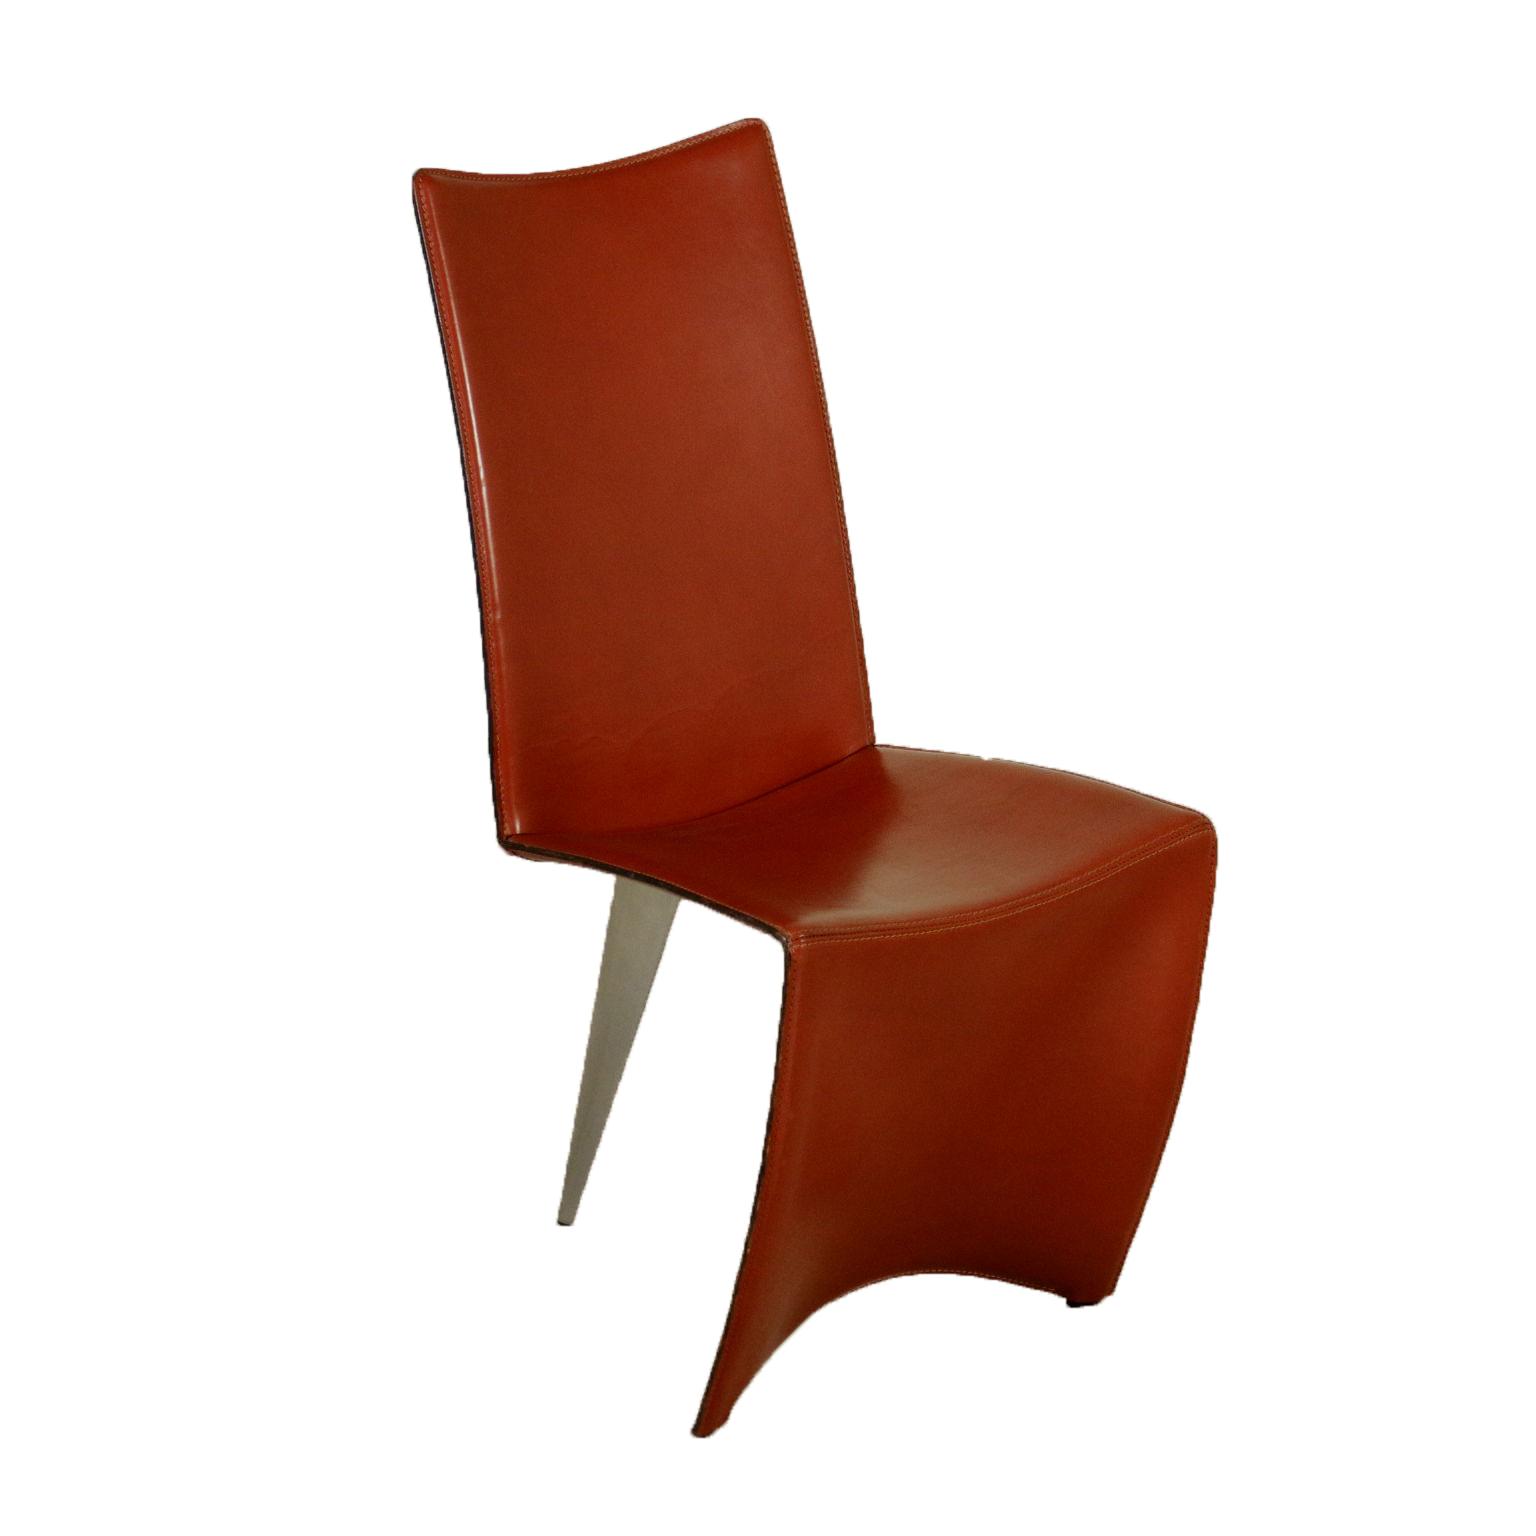 Sedia Philippe Starck - Sedie - Modernariato - dimanoinmano.it